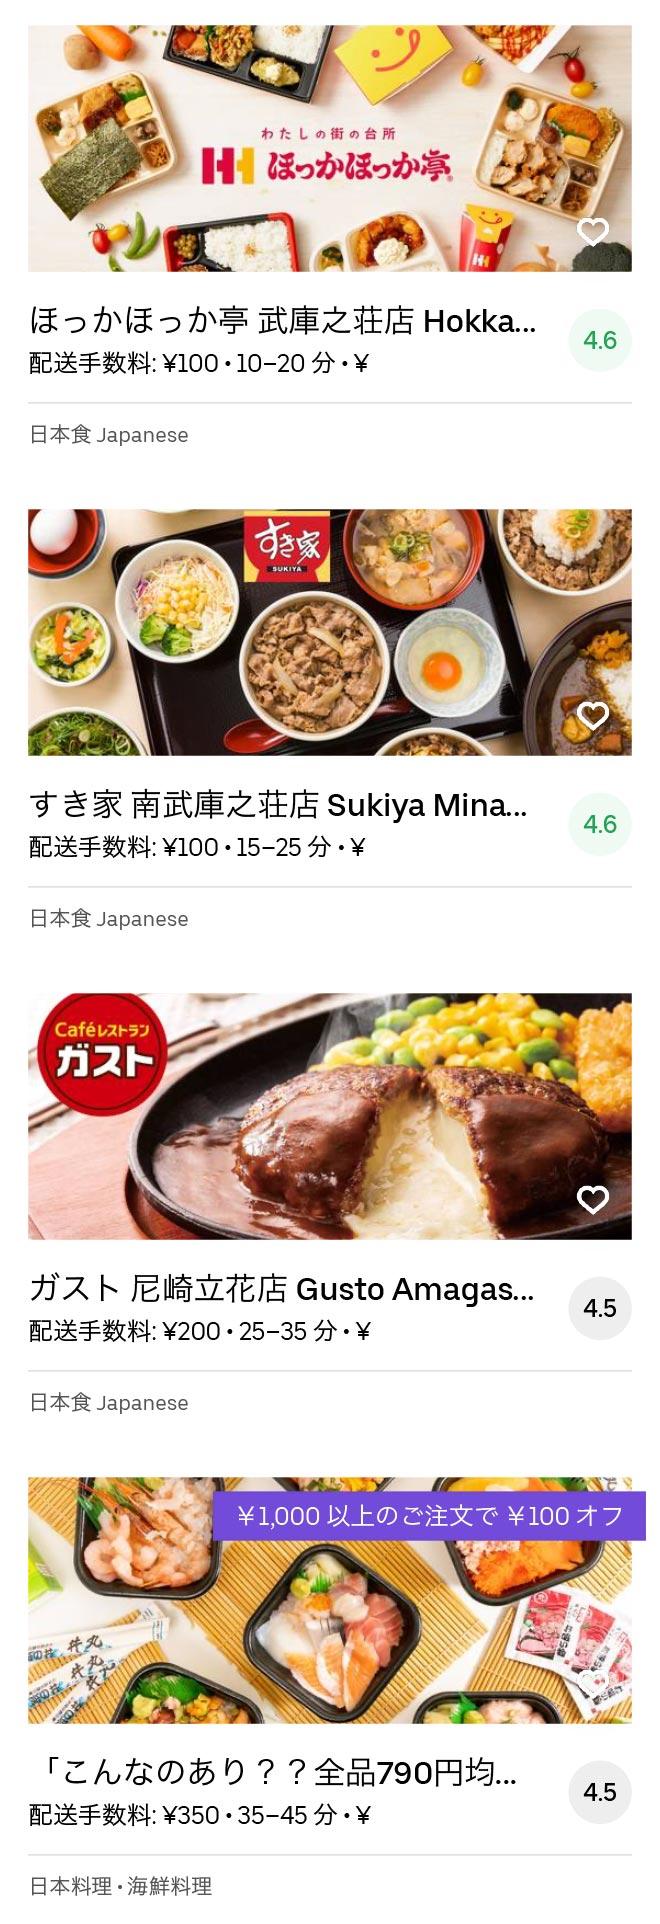 Amagasaki mukonosou menu 2005 04